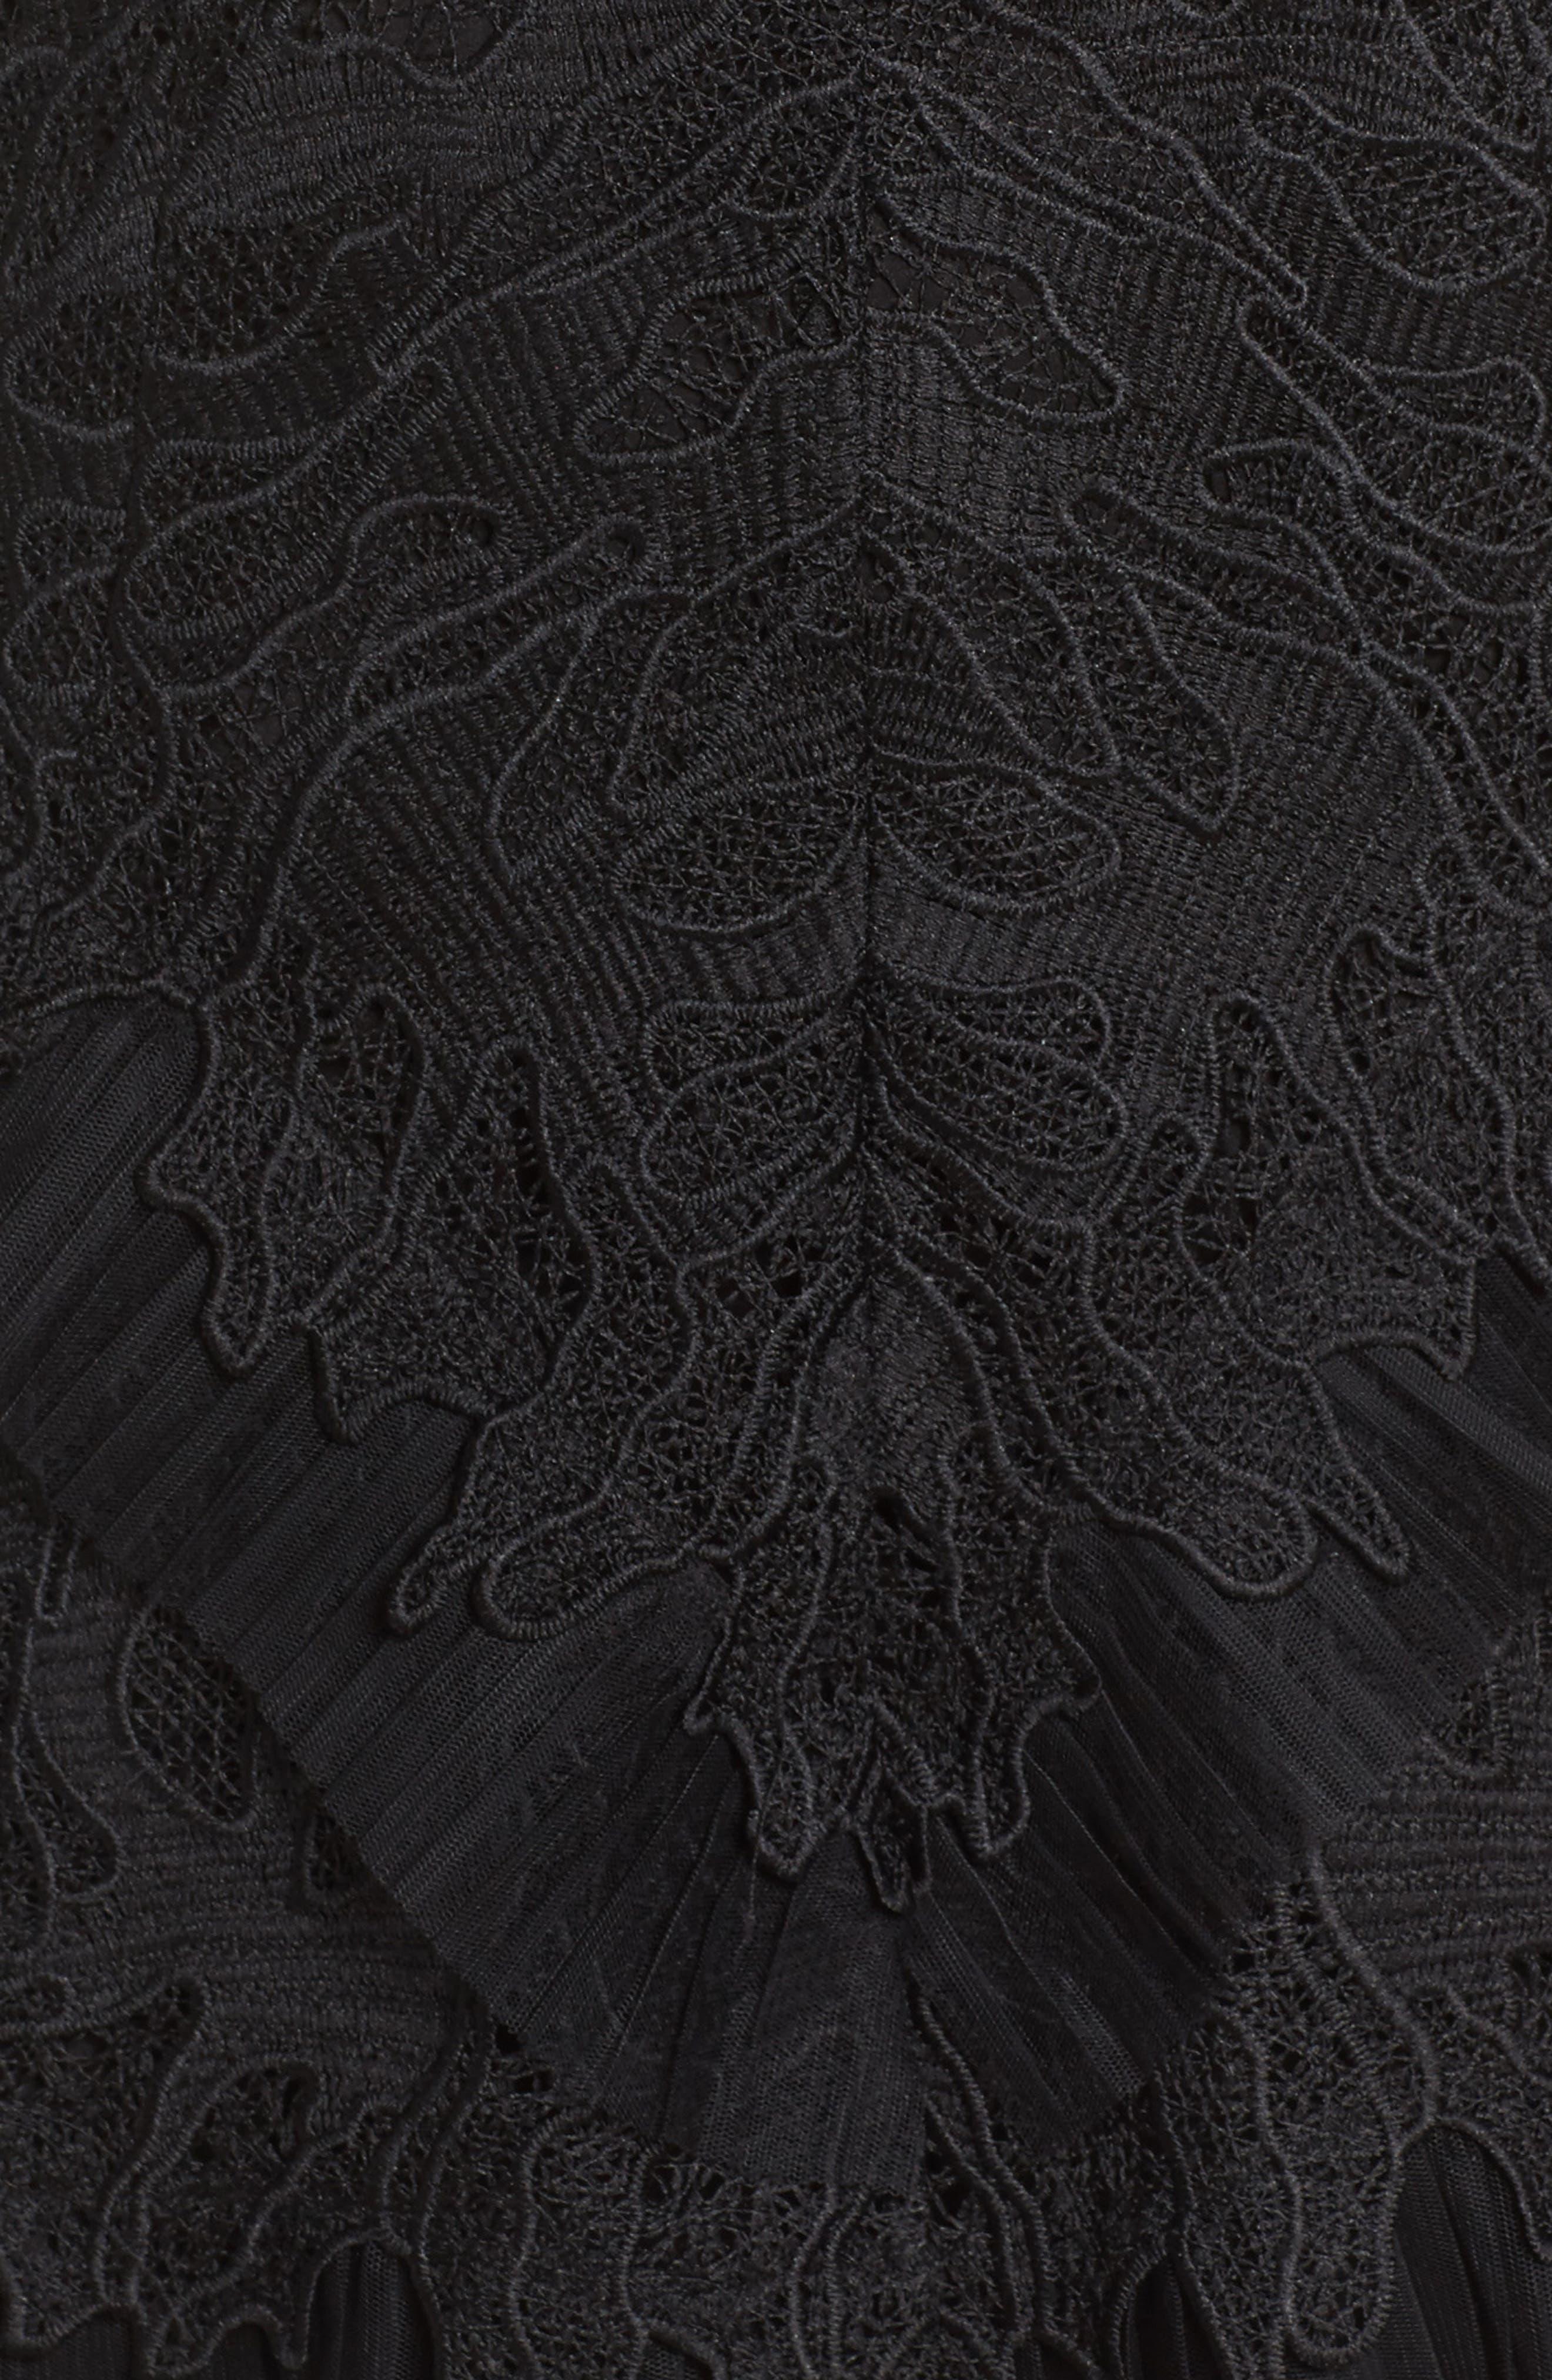 Ruffle Trim Lace Sheath Dress,                             Alternate thumbnail 5, color,                             001